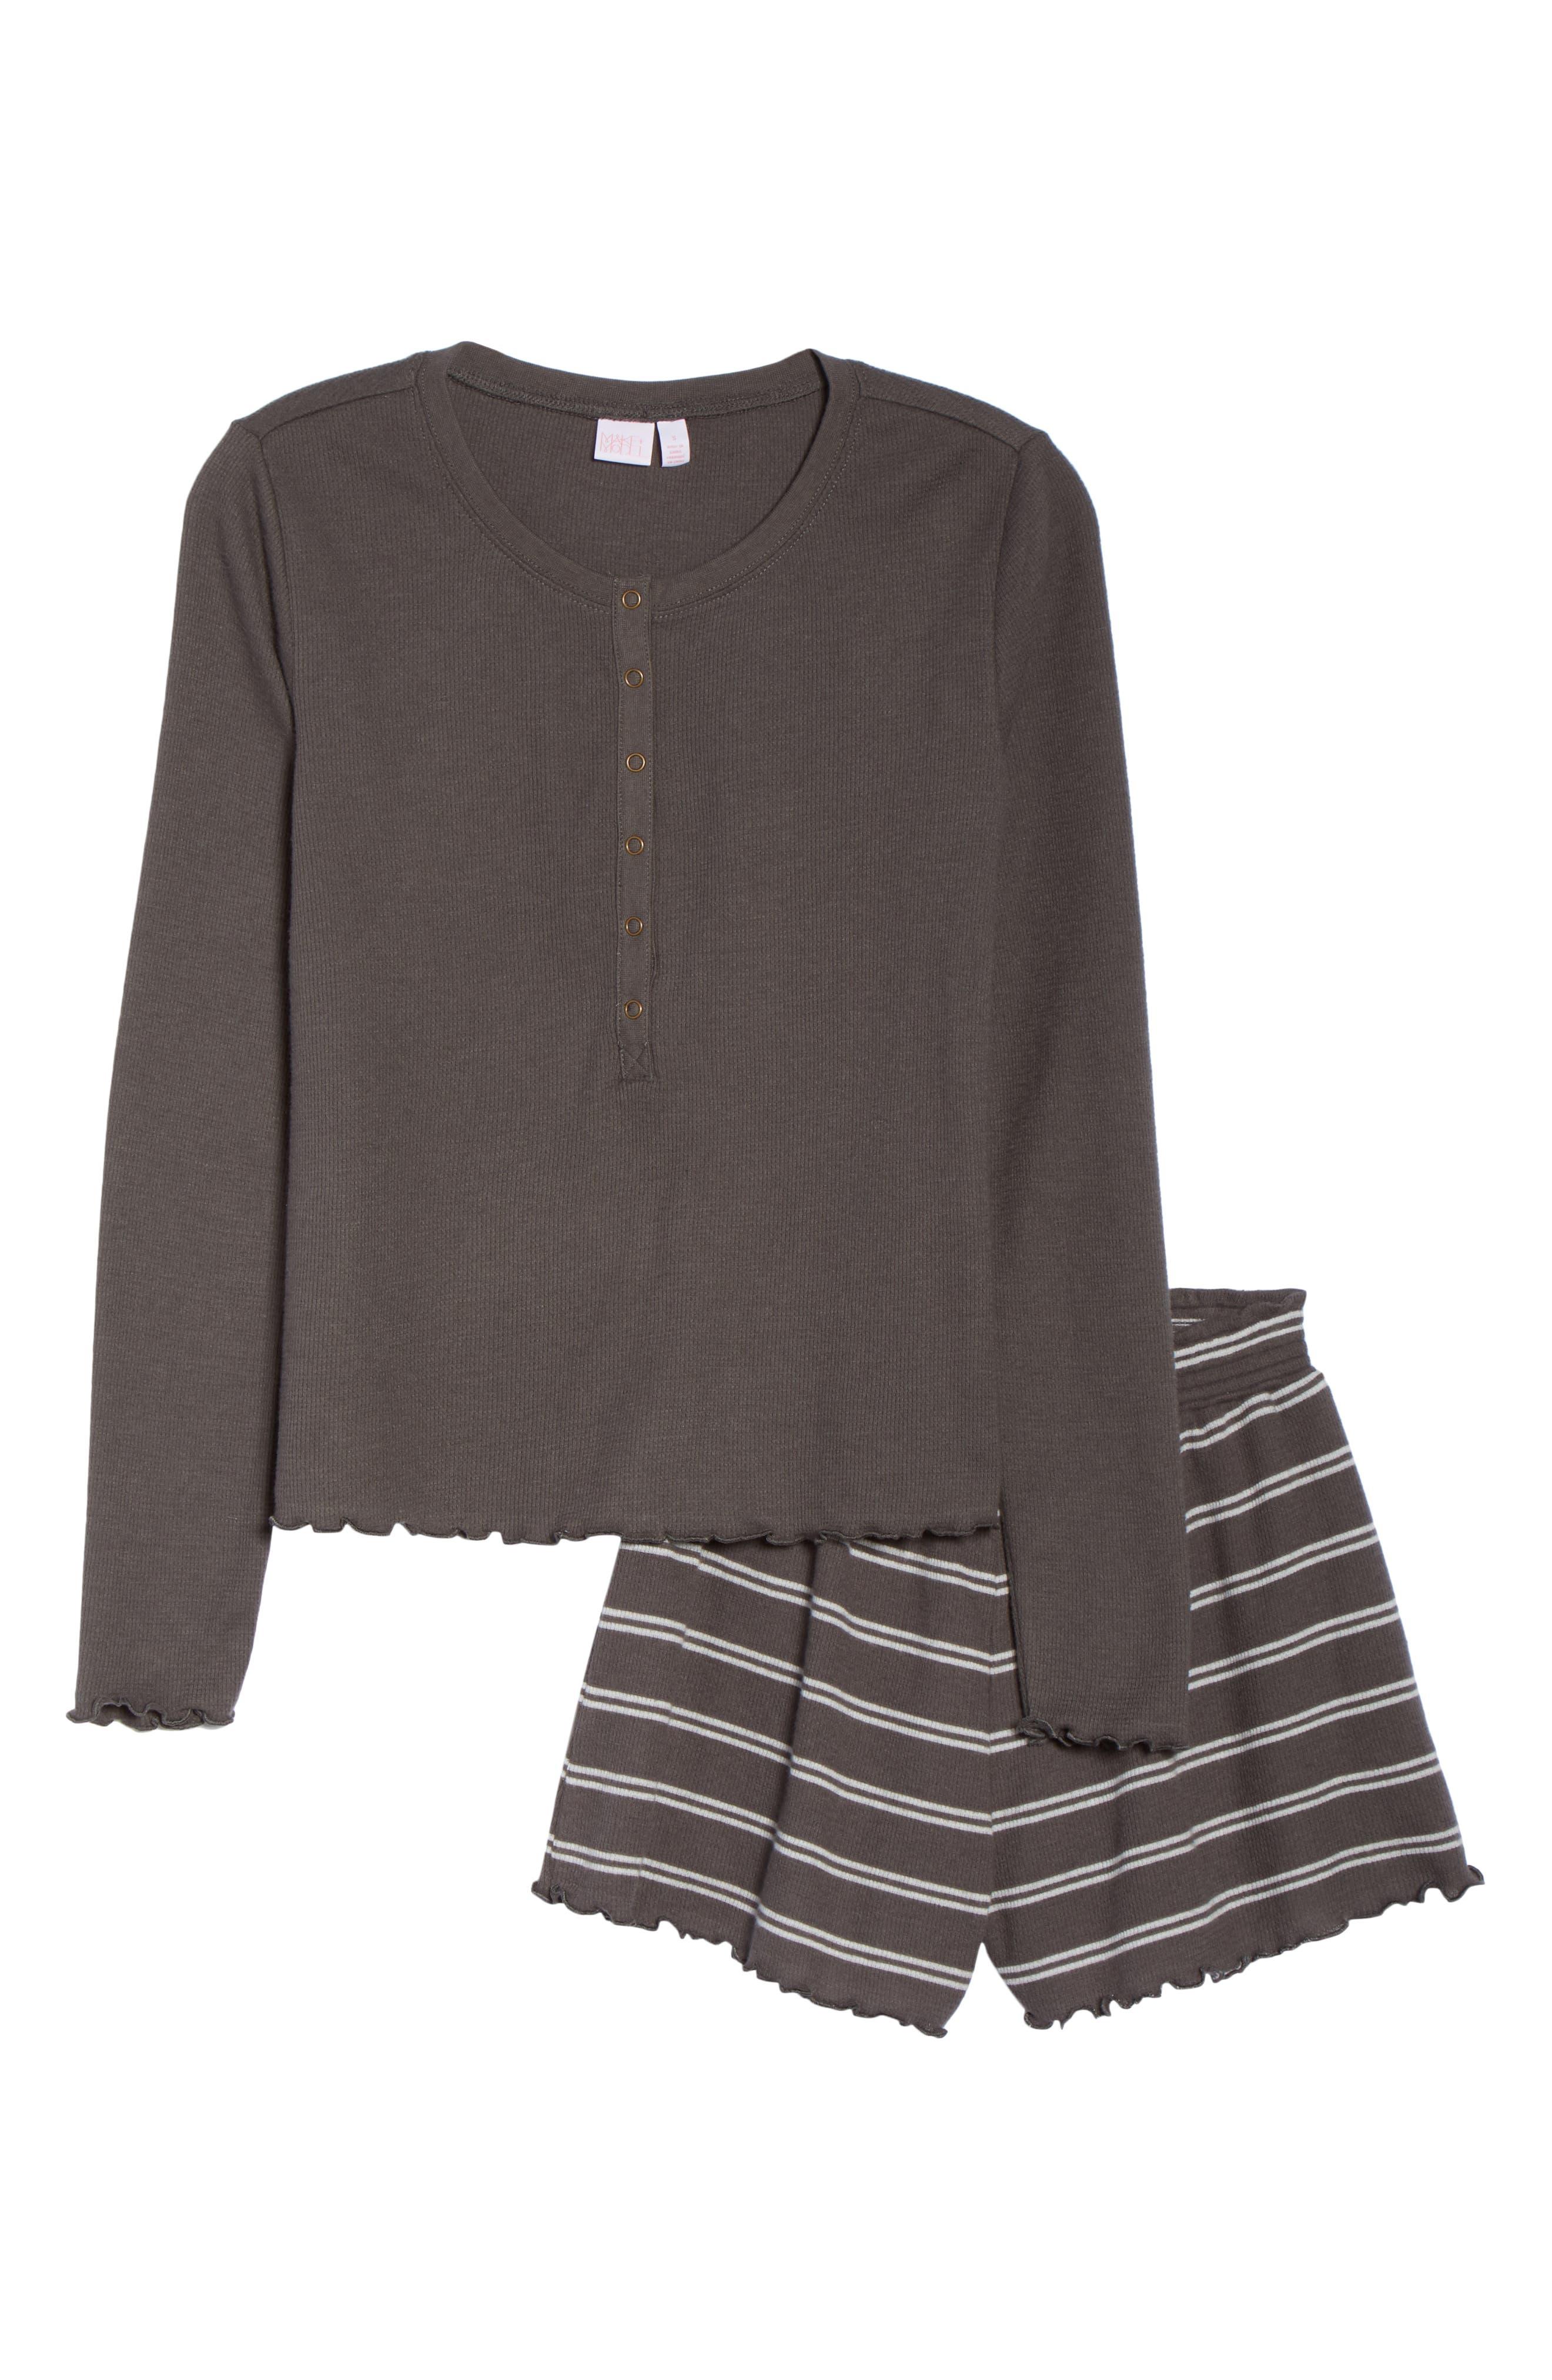 MAKE + MODEL,                             You Do You Thermal Short Pajamas,                             Alternate thumbnail 6, color,                             GREY PAVEMENT